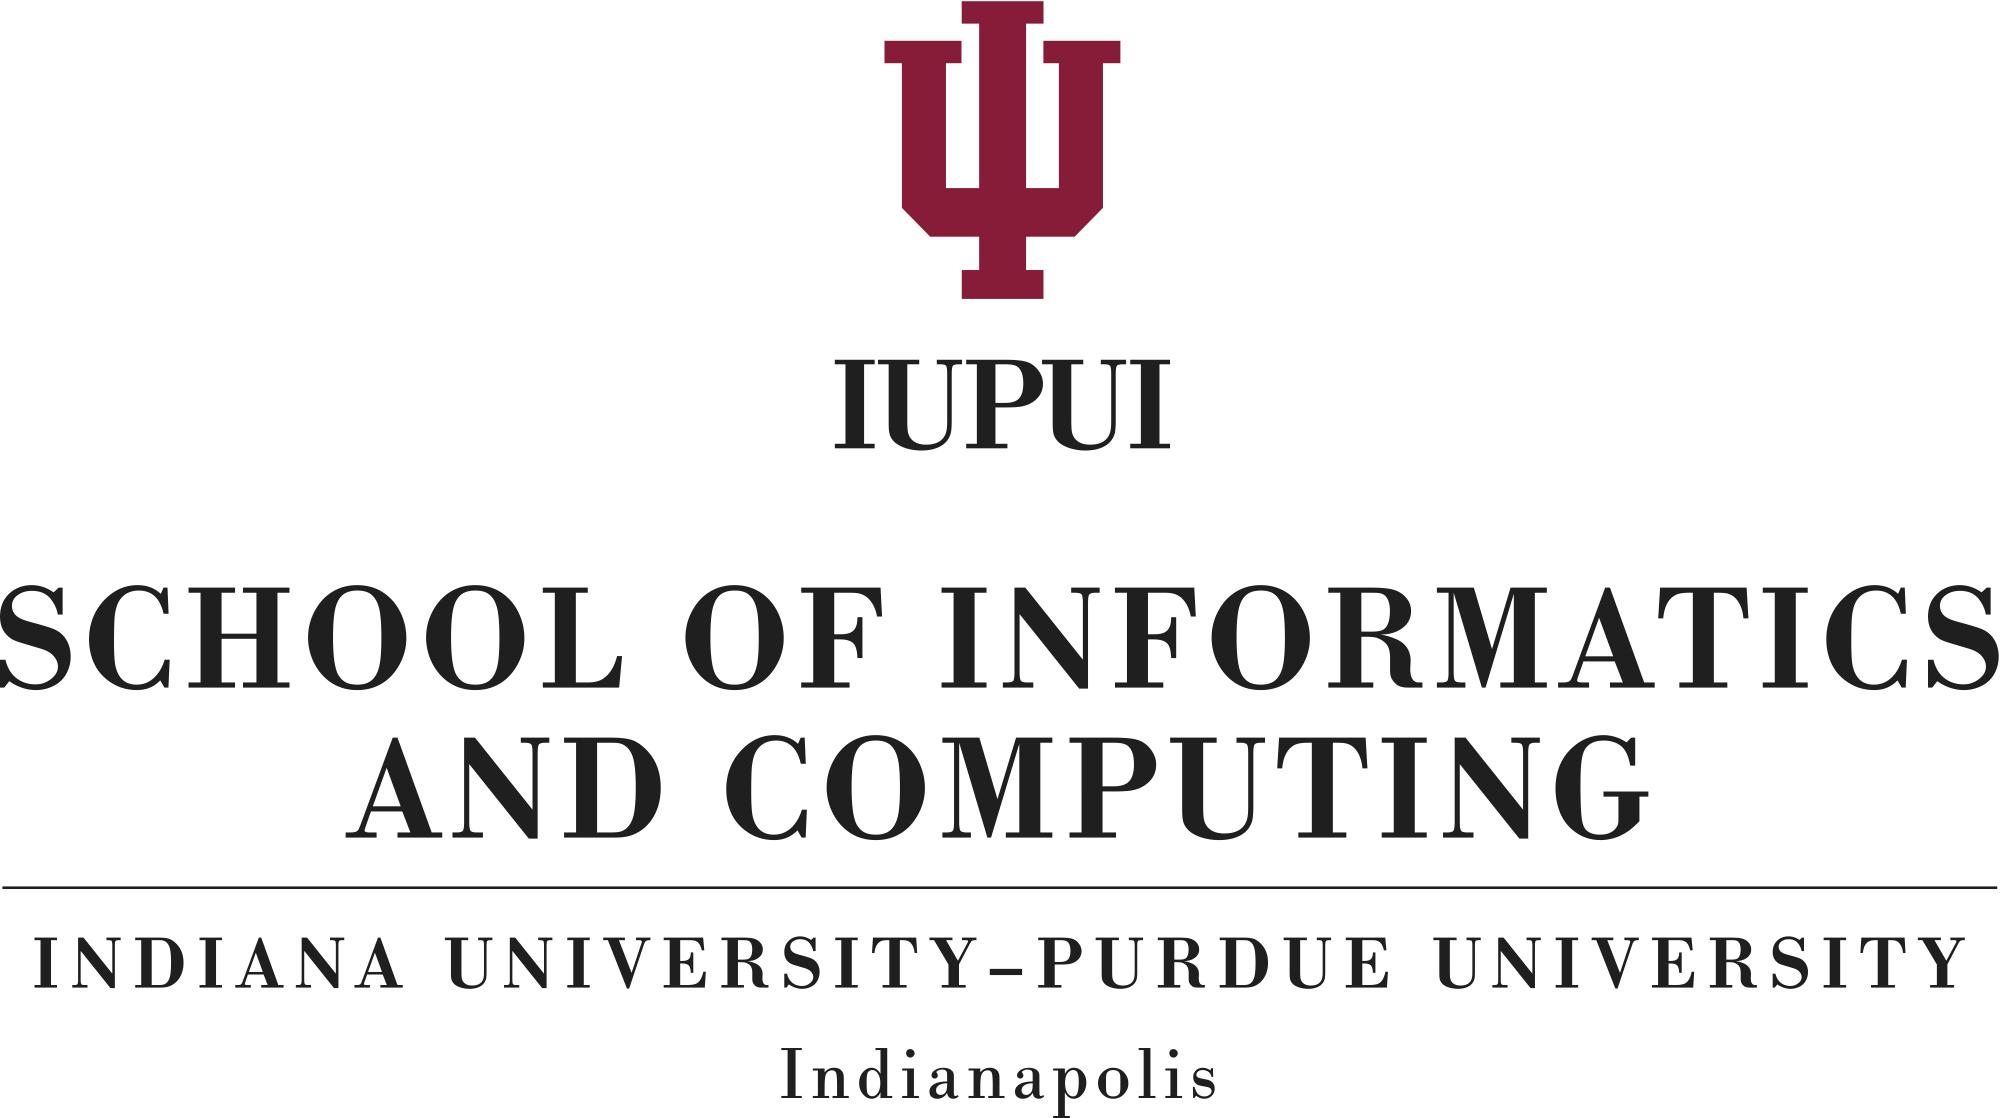 IU School of Informatics & Computing Logo.png